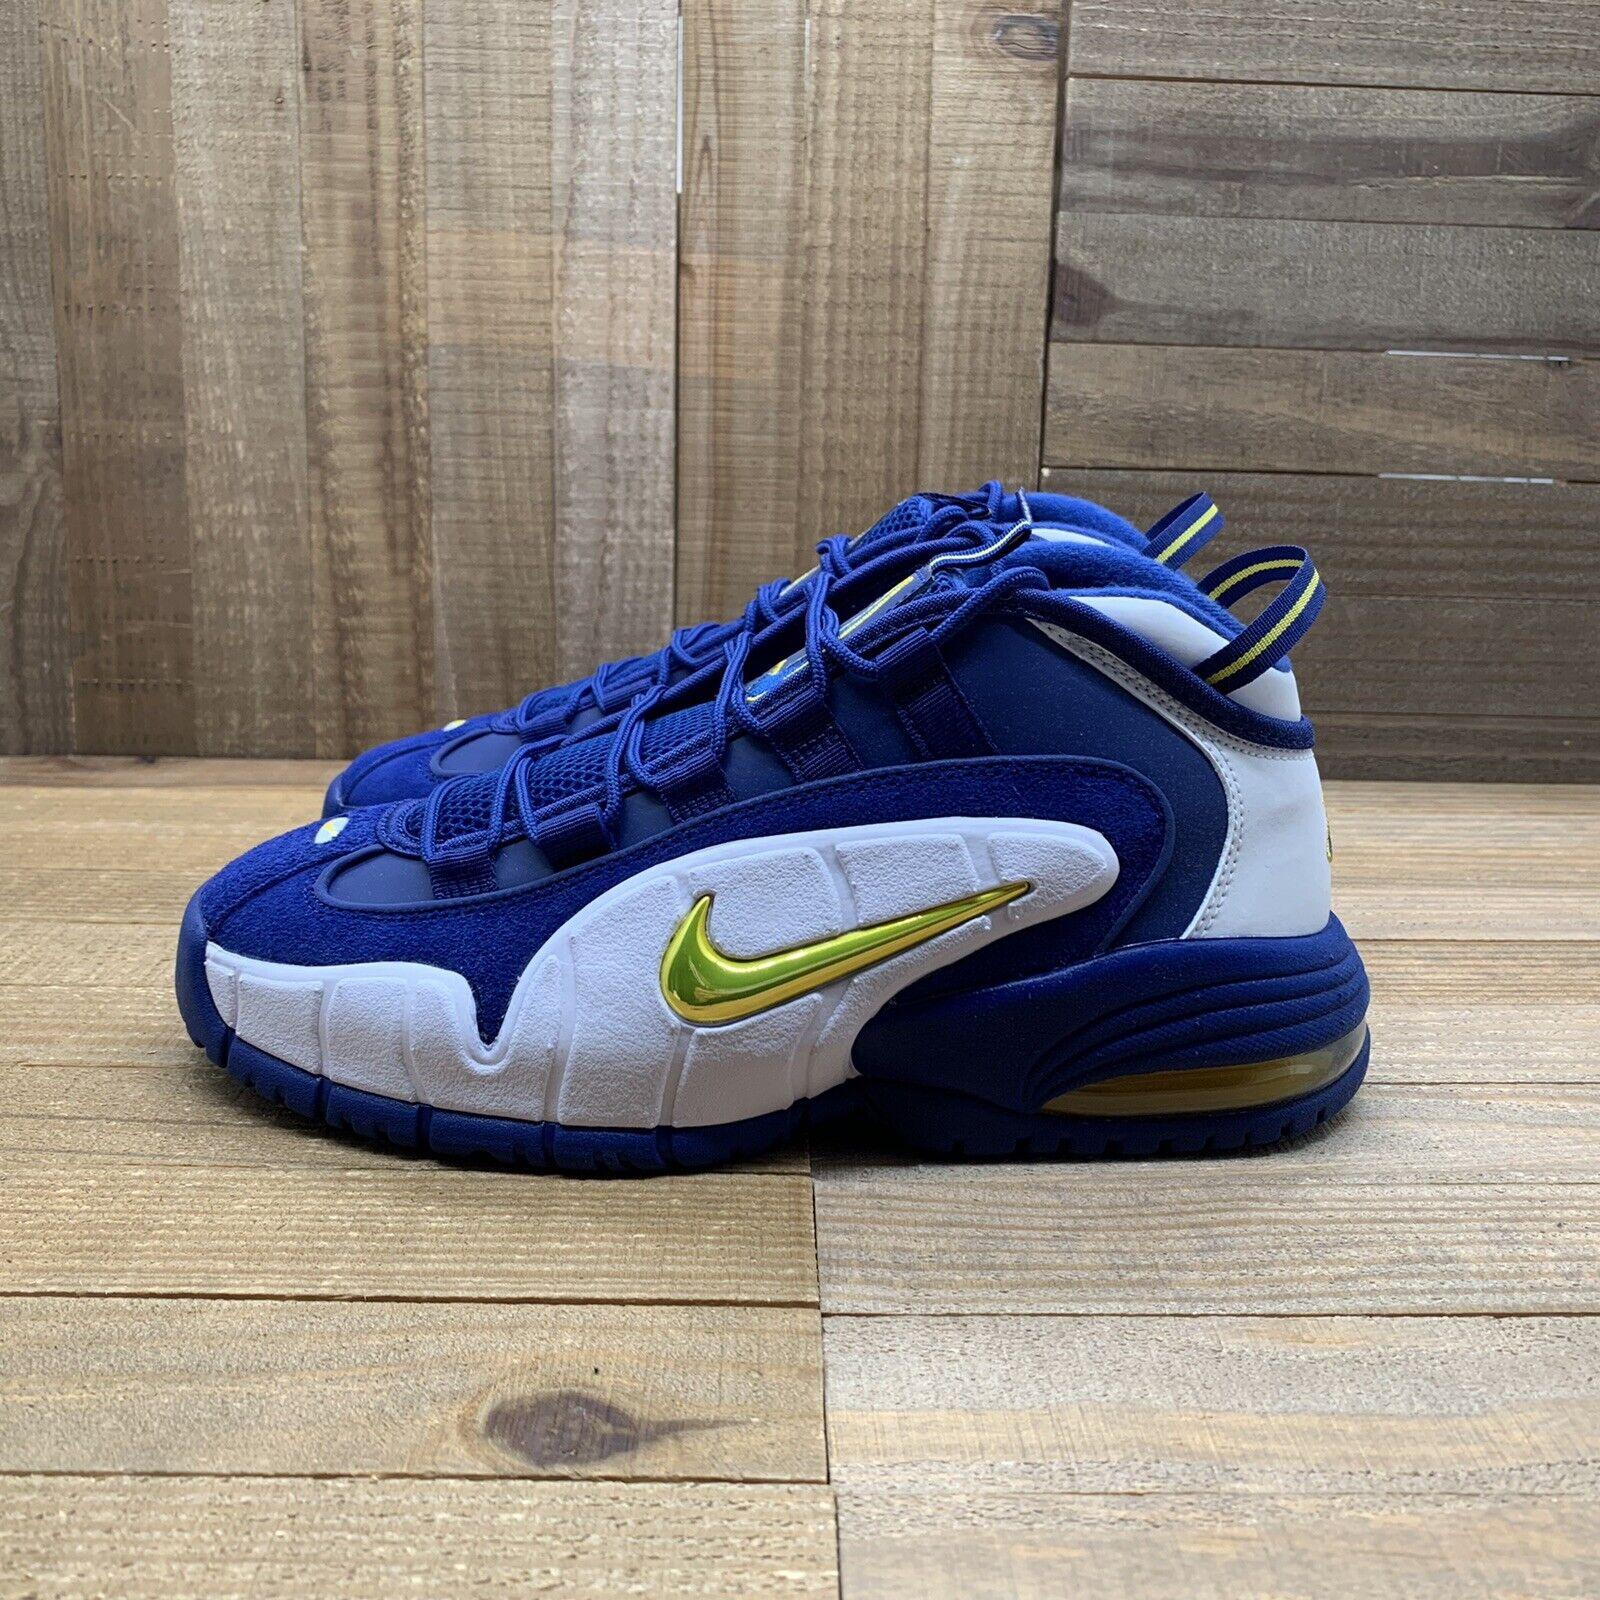 Nike Air Max Penny Warriors Sz 10.5 100